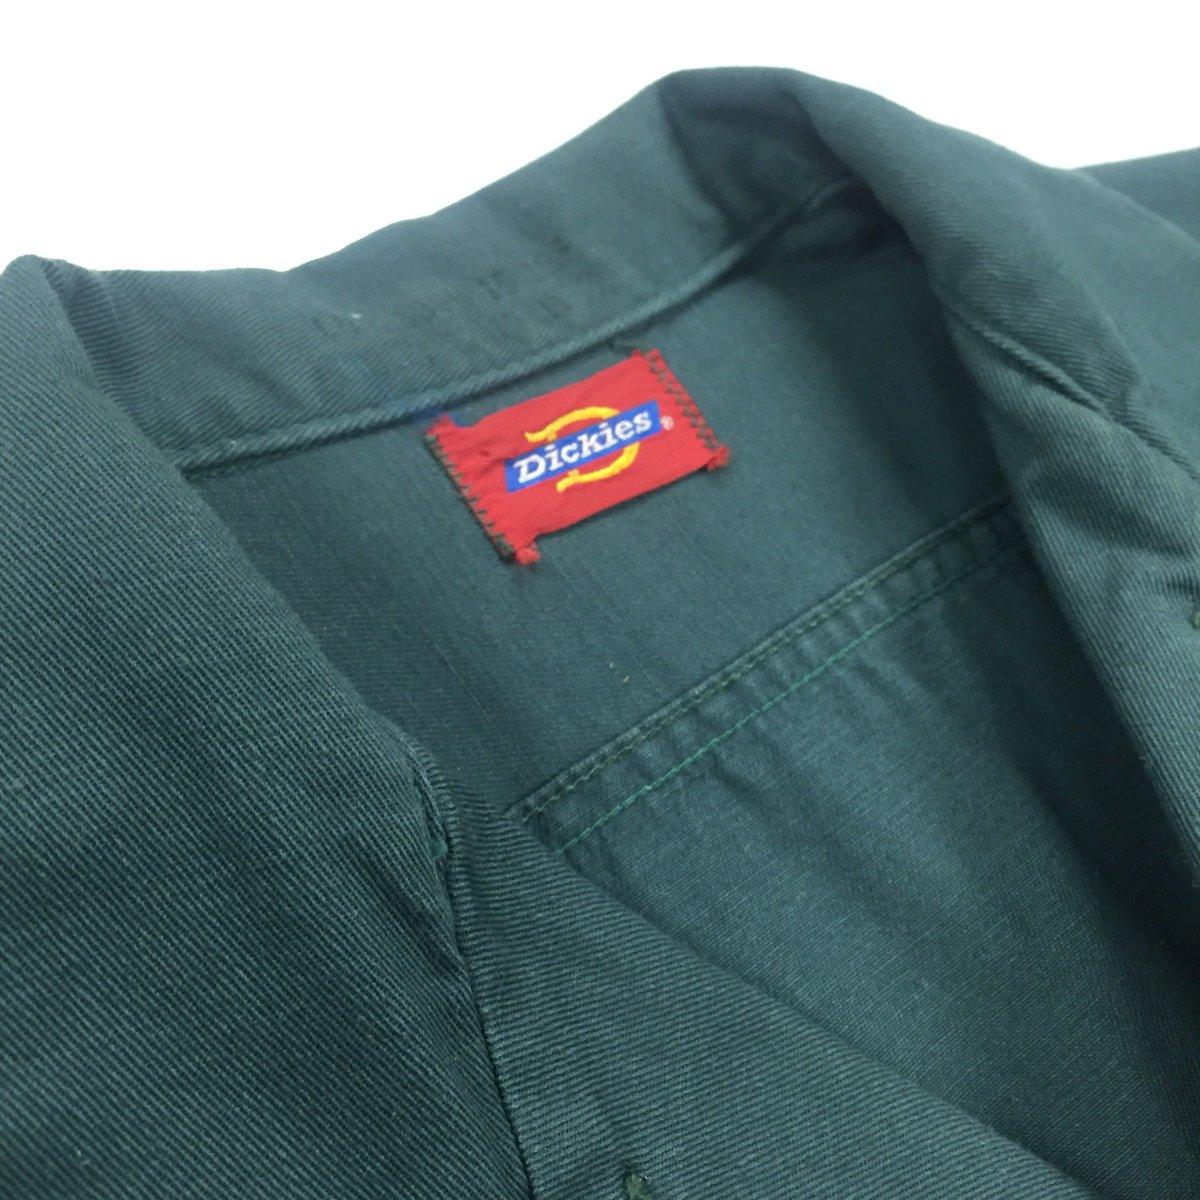 Dickies در توییتر Vintage Dickies Label From The 1950s Still Looks Damn Good Dickiesworkwear Vintage